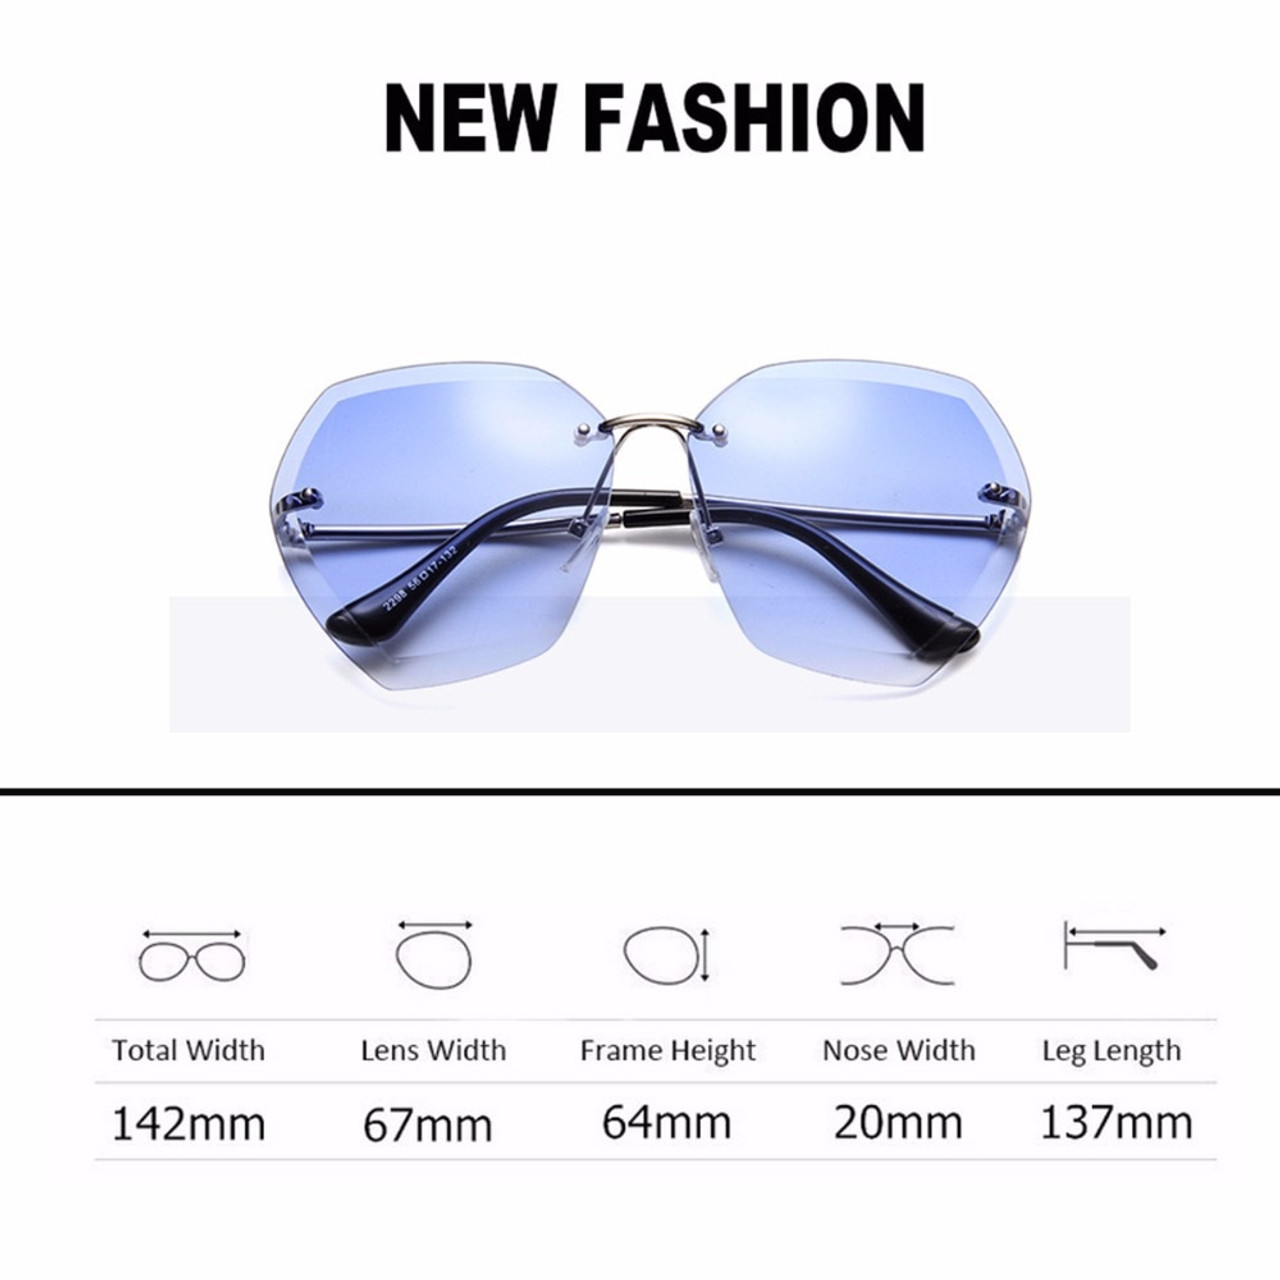 d499a5ba2 ... 2018 Luxury Vintage Rimless sunglasses women Brand Designer Oversized sunglasses  Female sun glasses for lady Mirror ...